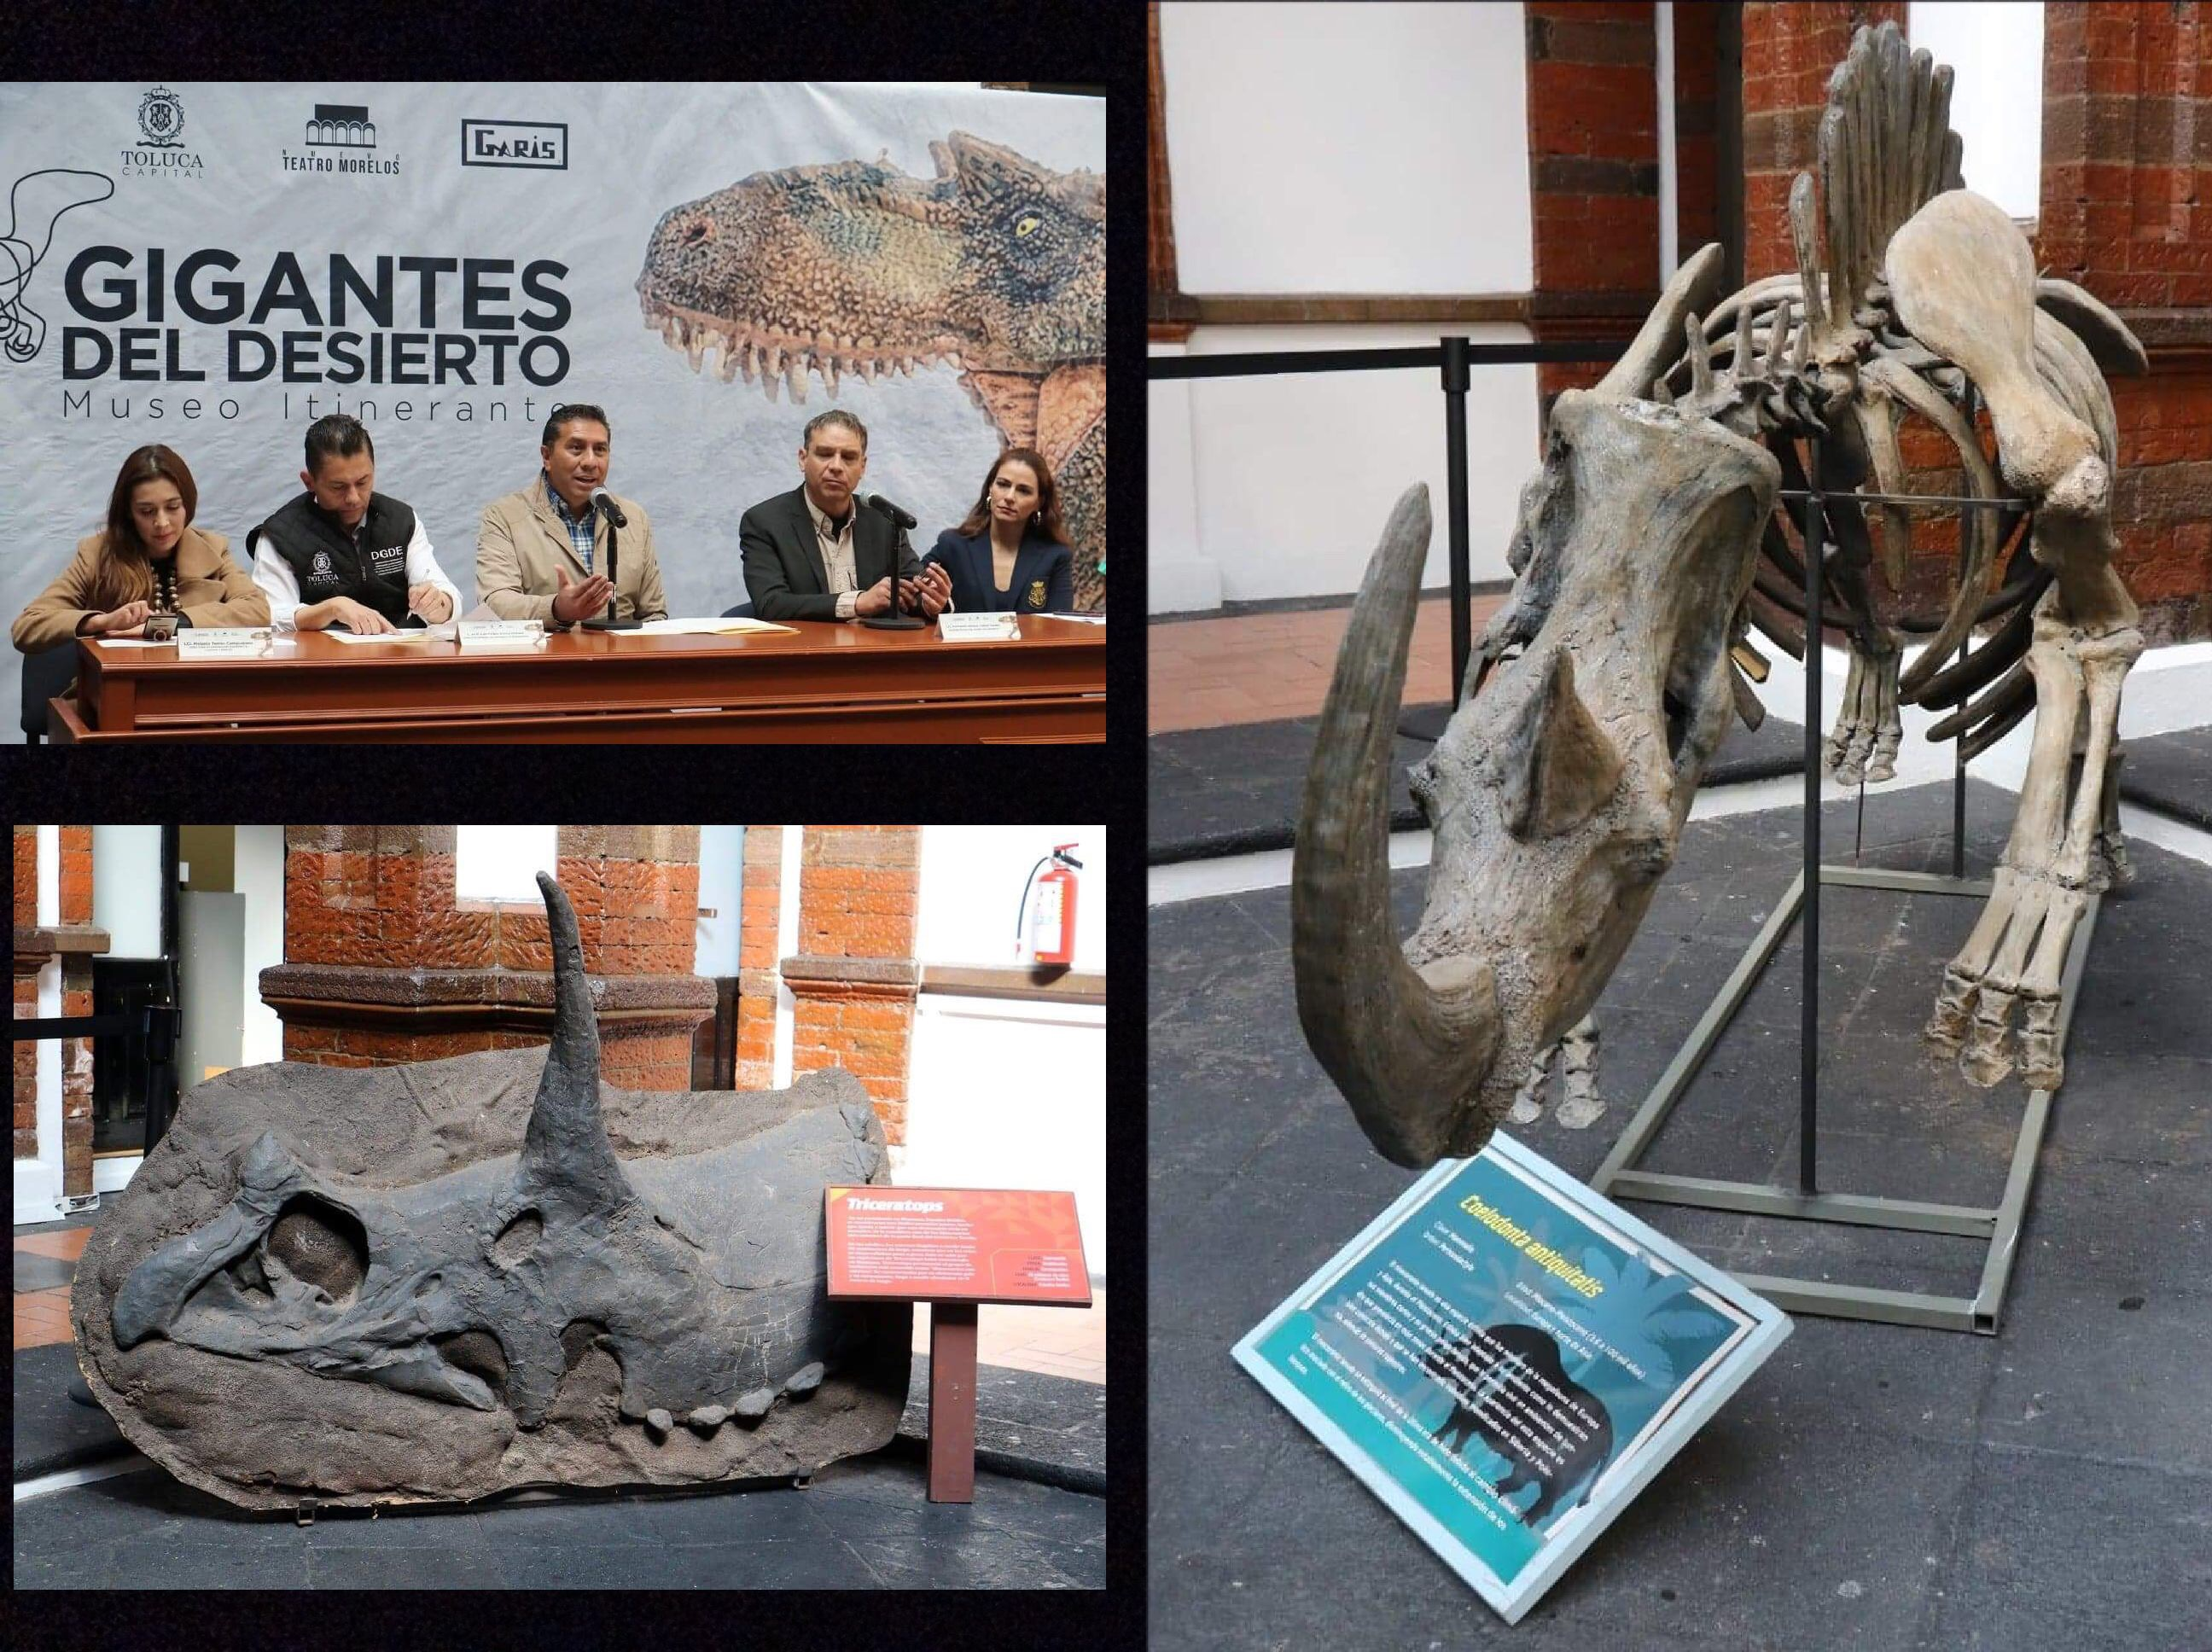 Llega a Toluca Gigantes del Desierto, Museo Itinerante